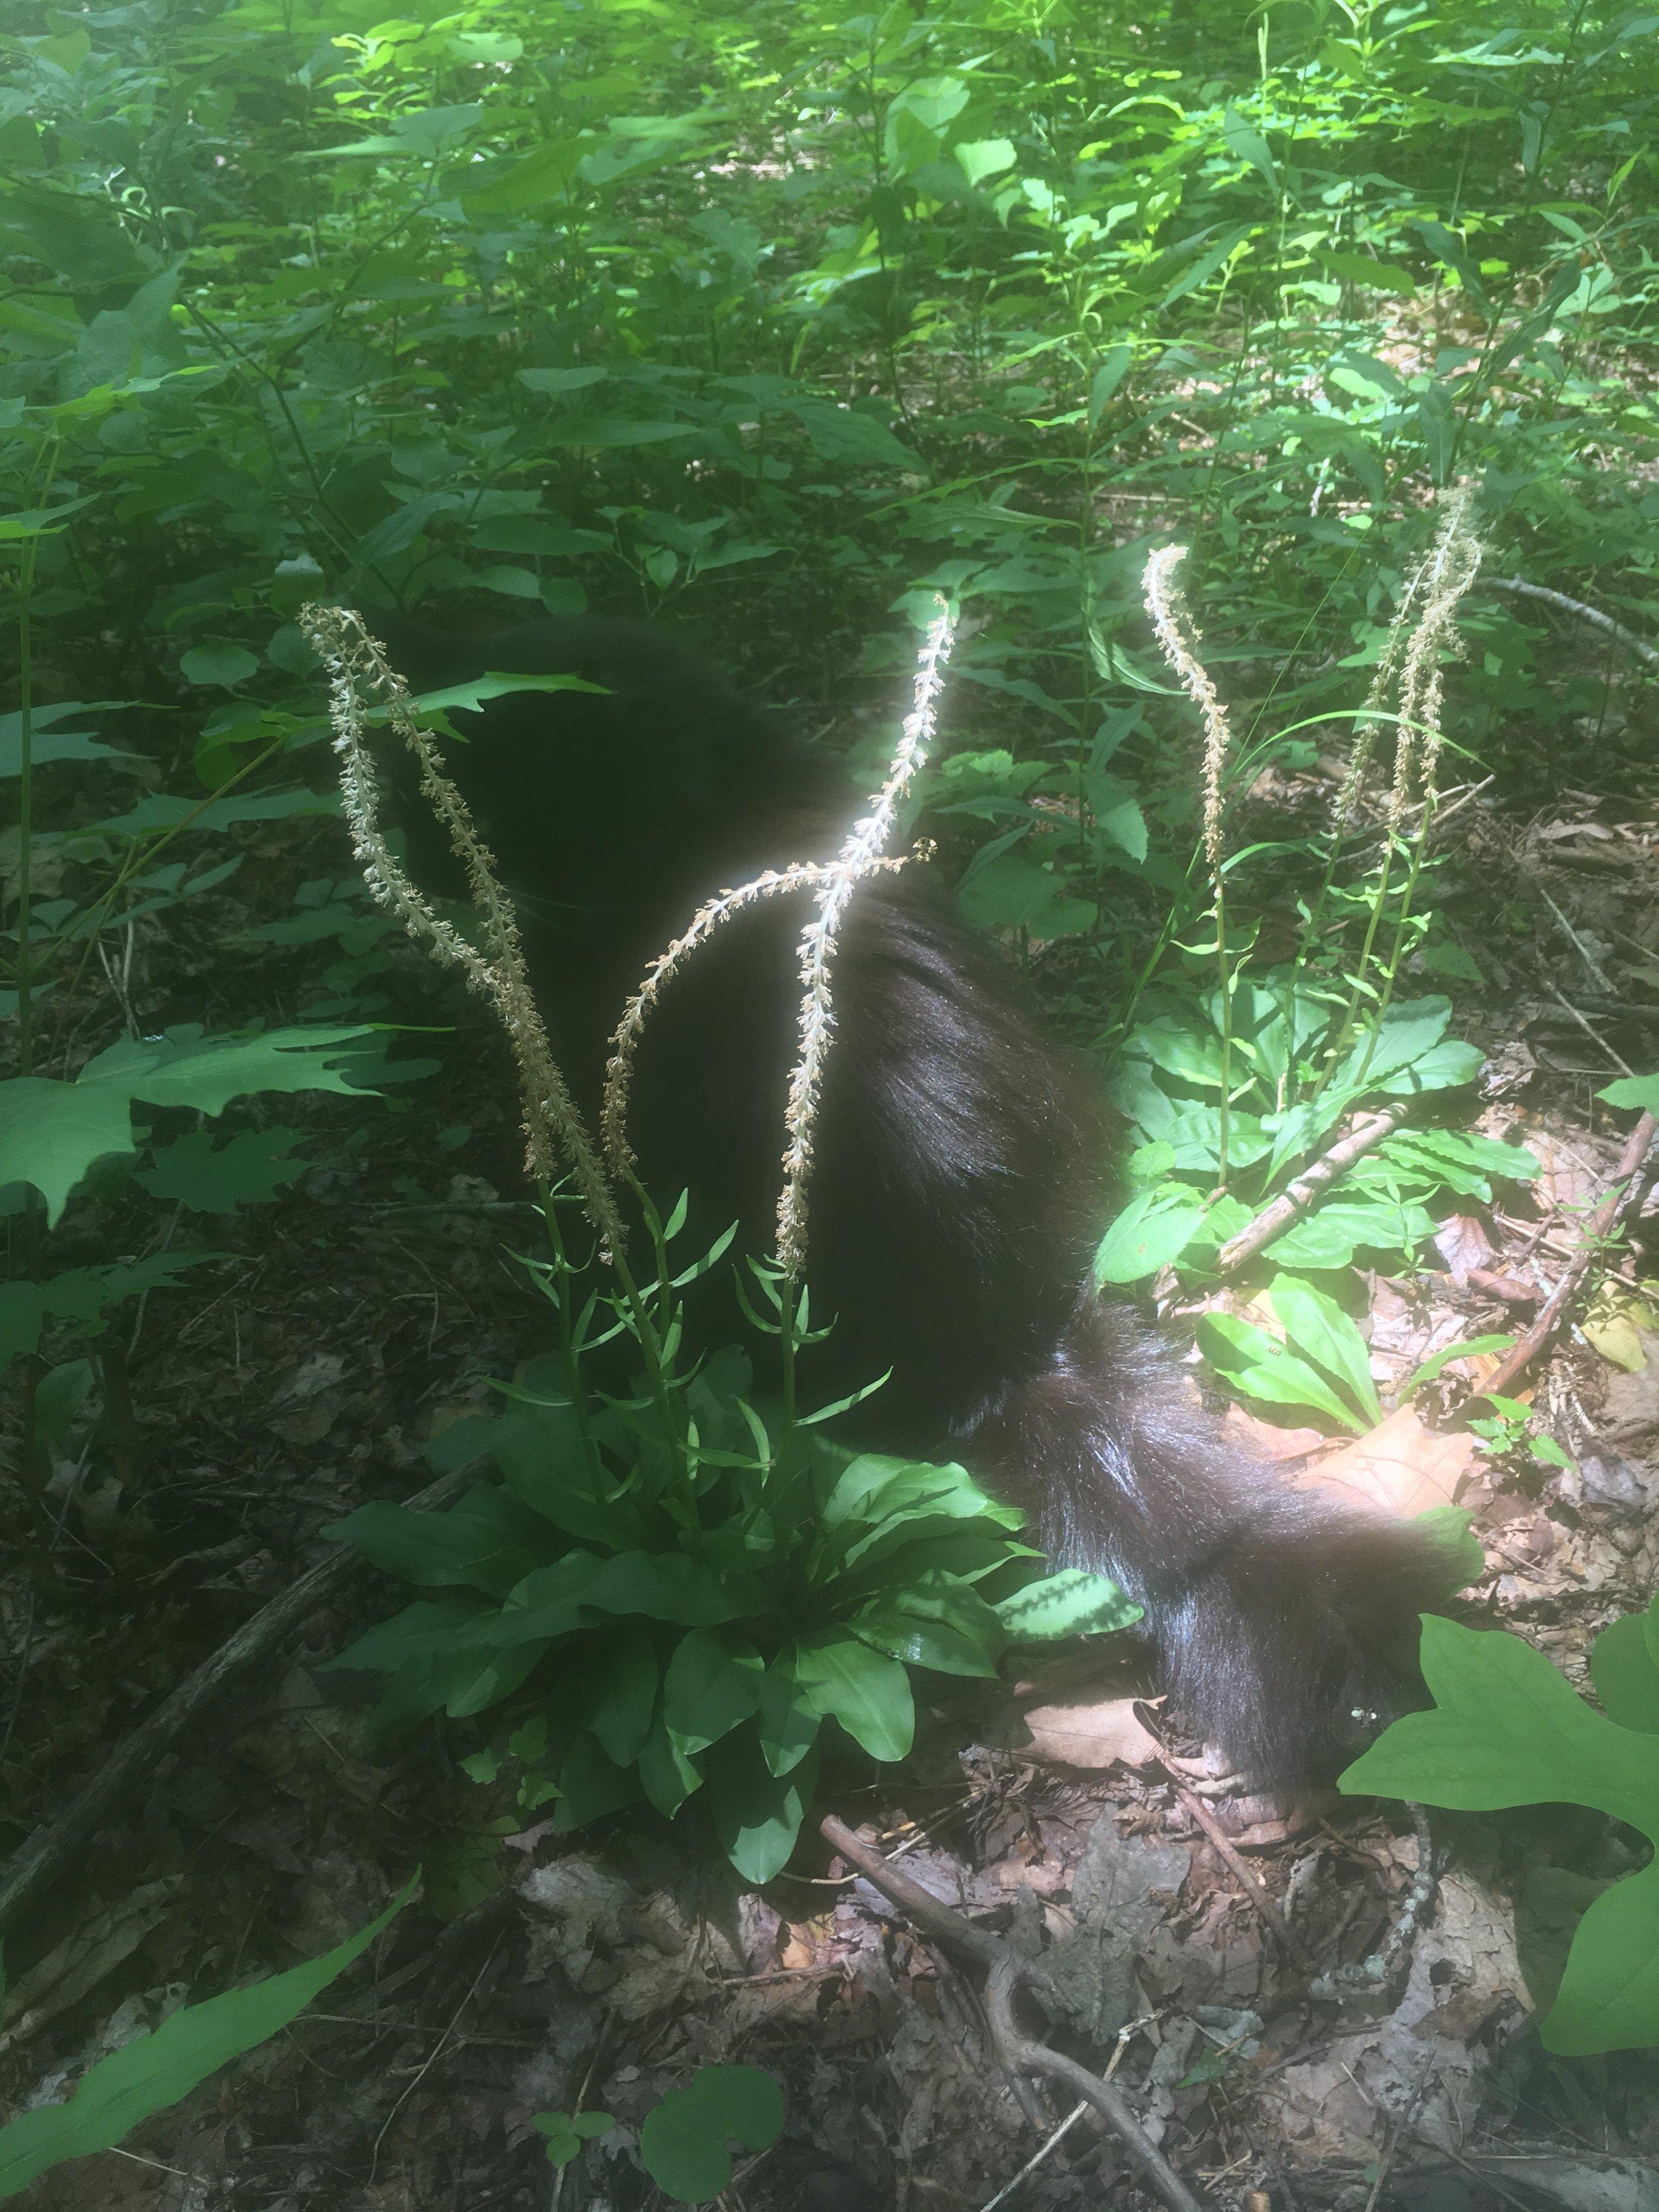 Cat with flowering false unicorn